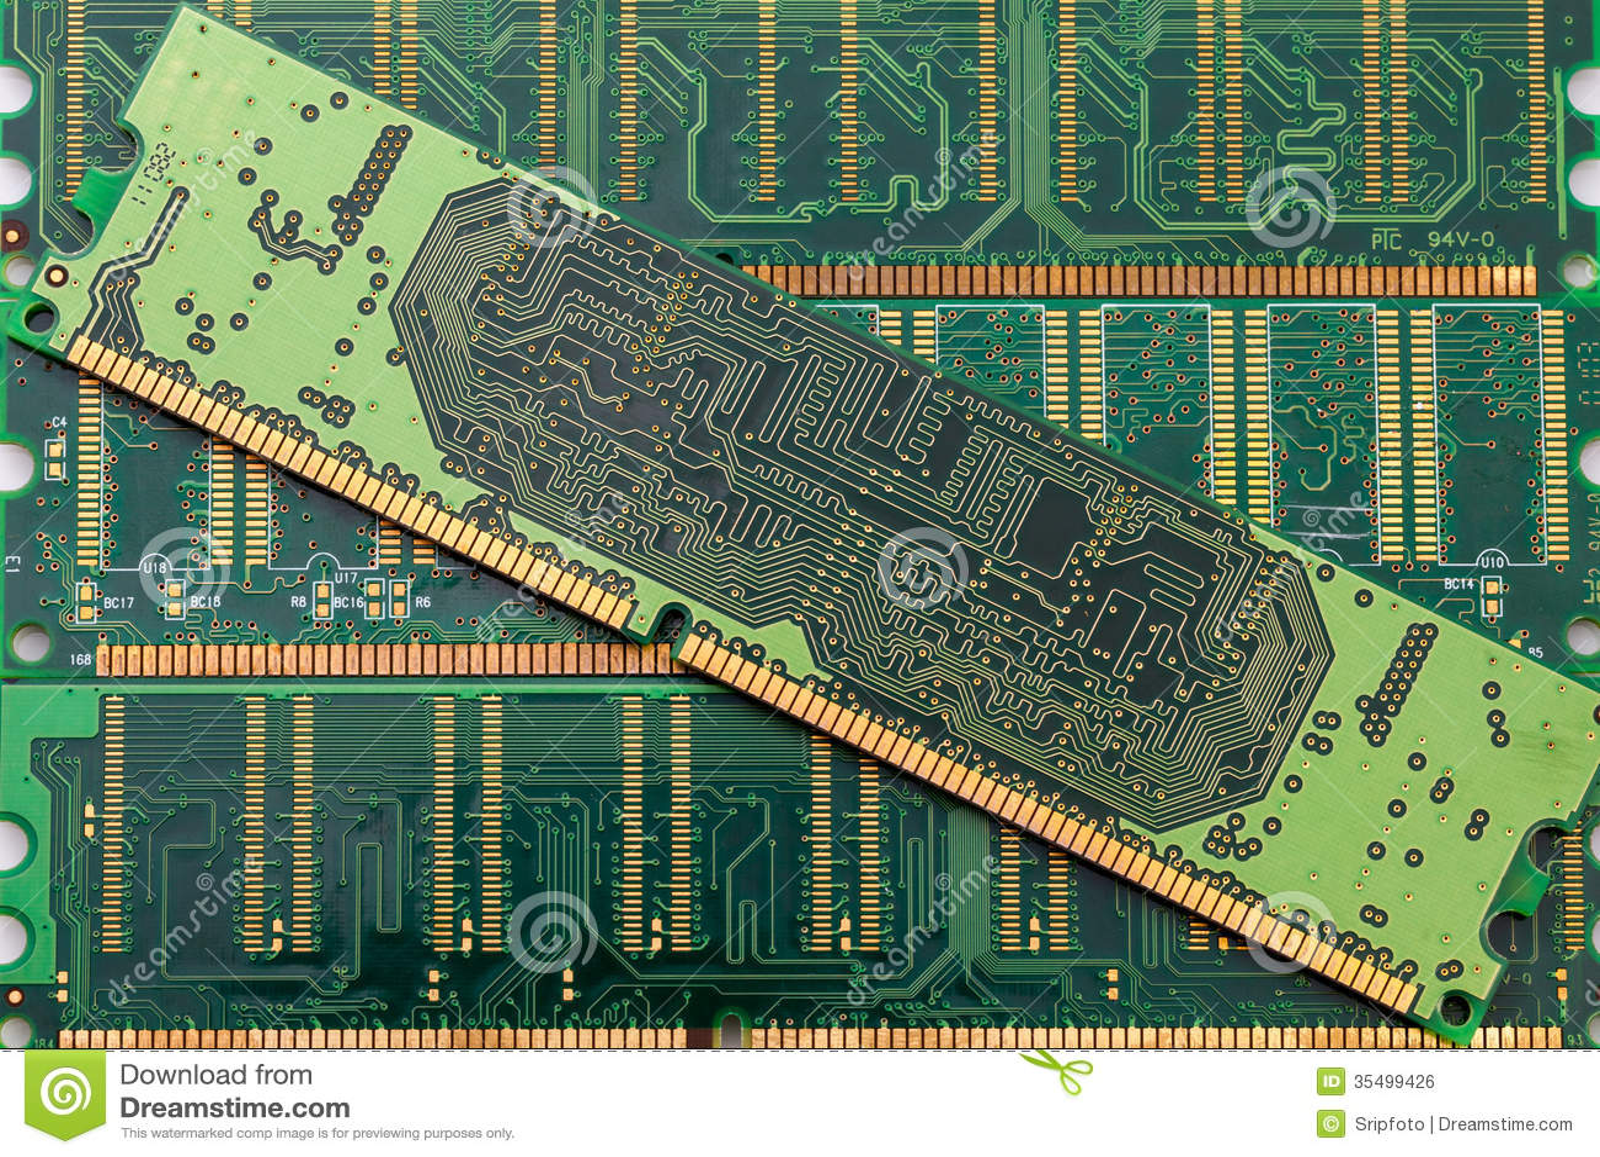 Random Access Memory (RAM) Royalty Free Stock Image - Image: 35499426